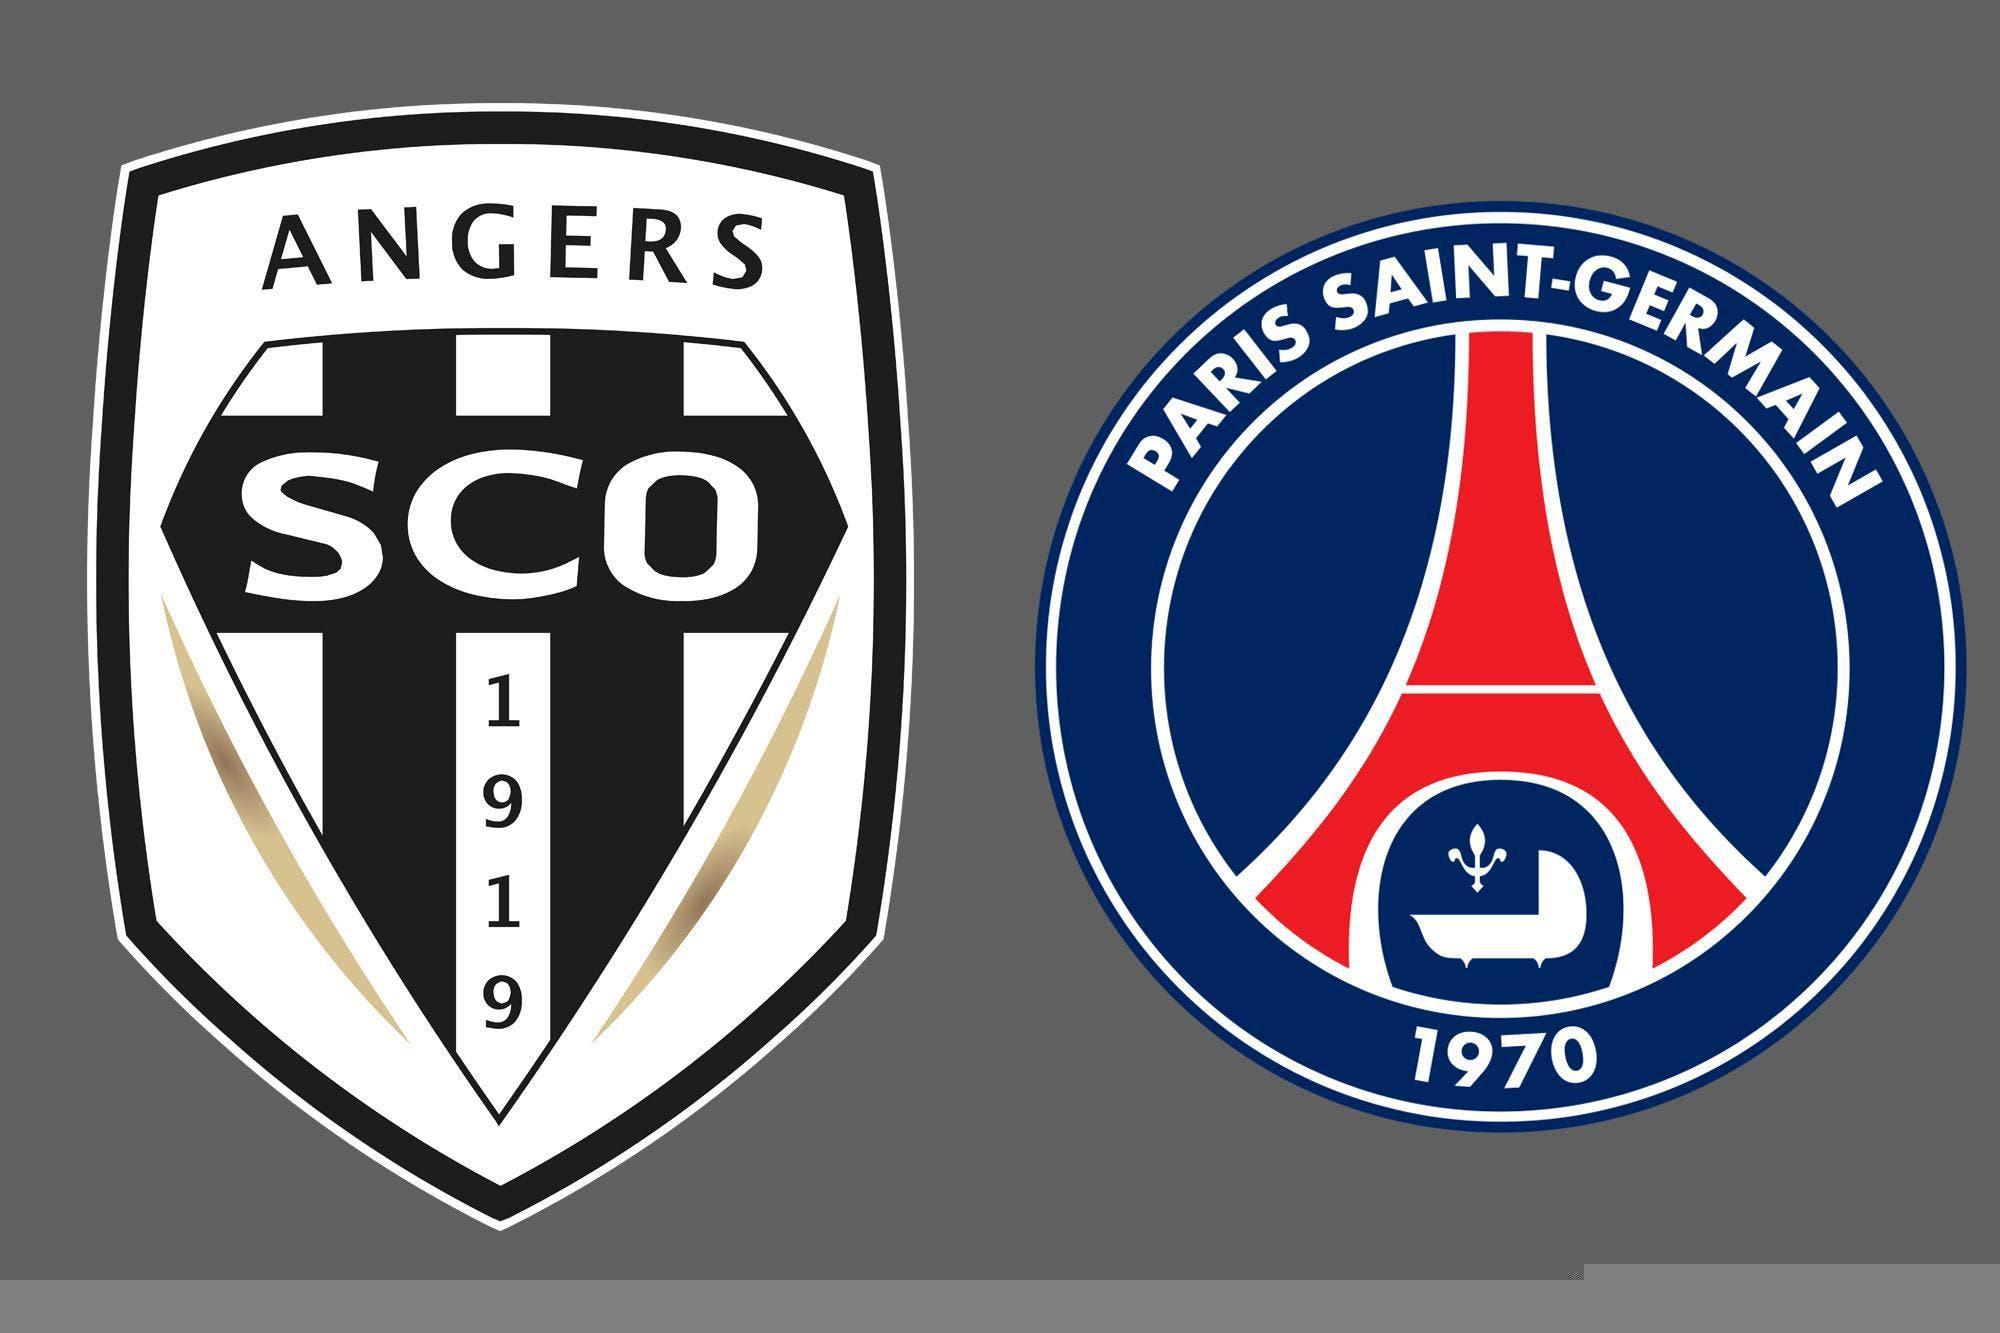 Ligue 1 de Francia: PSG venció por 1-0 a Angers como visitante